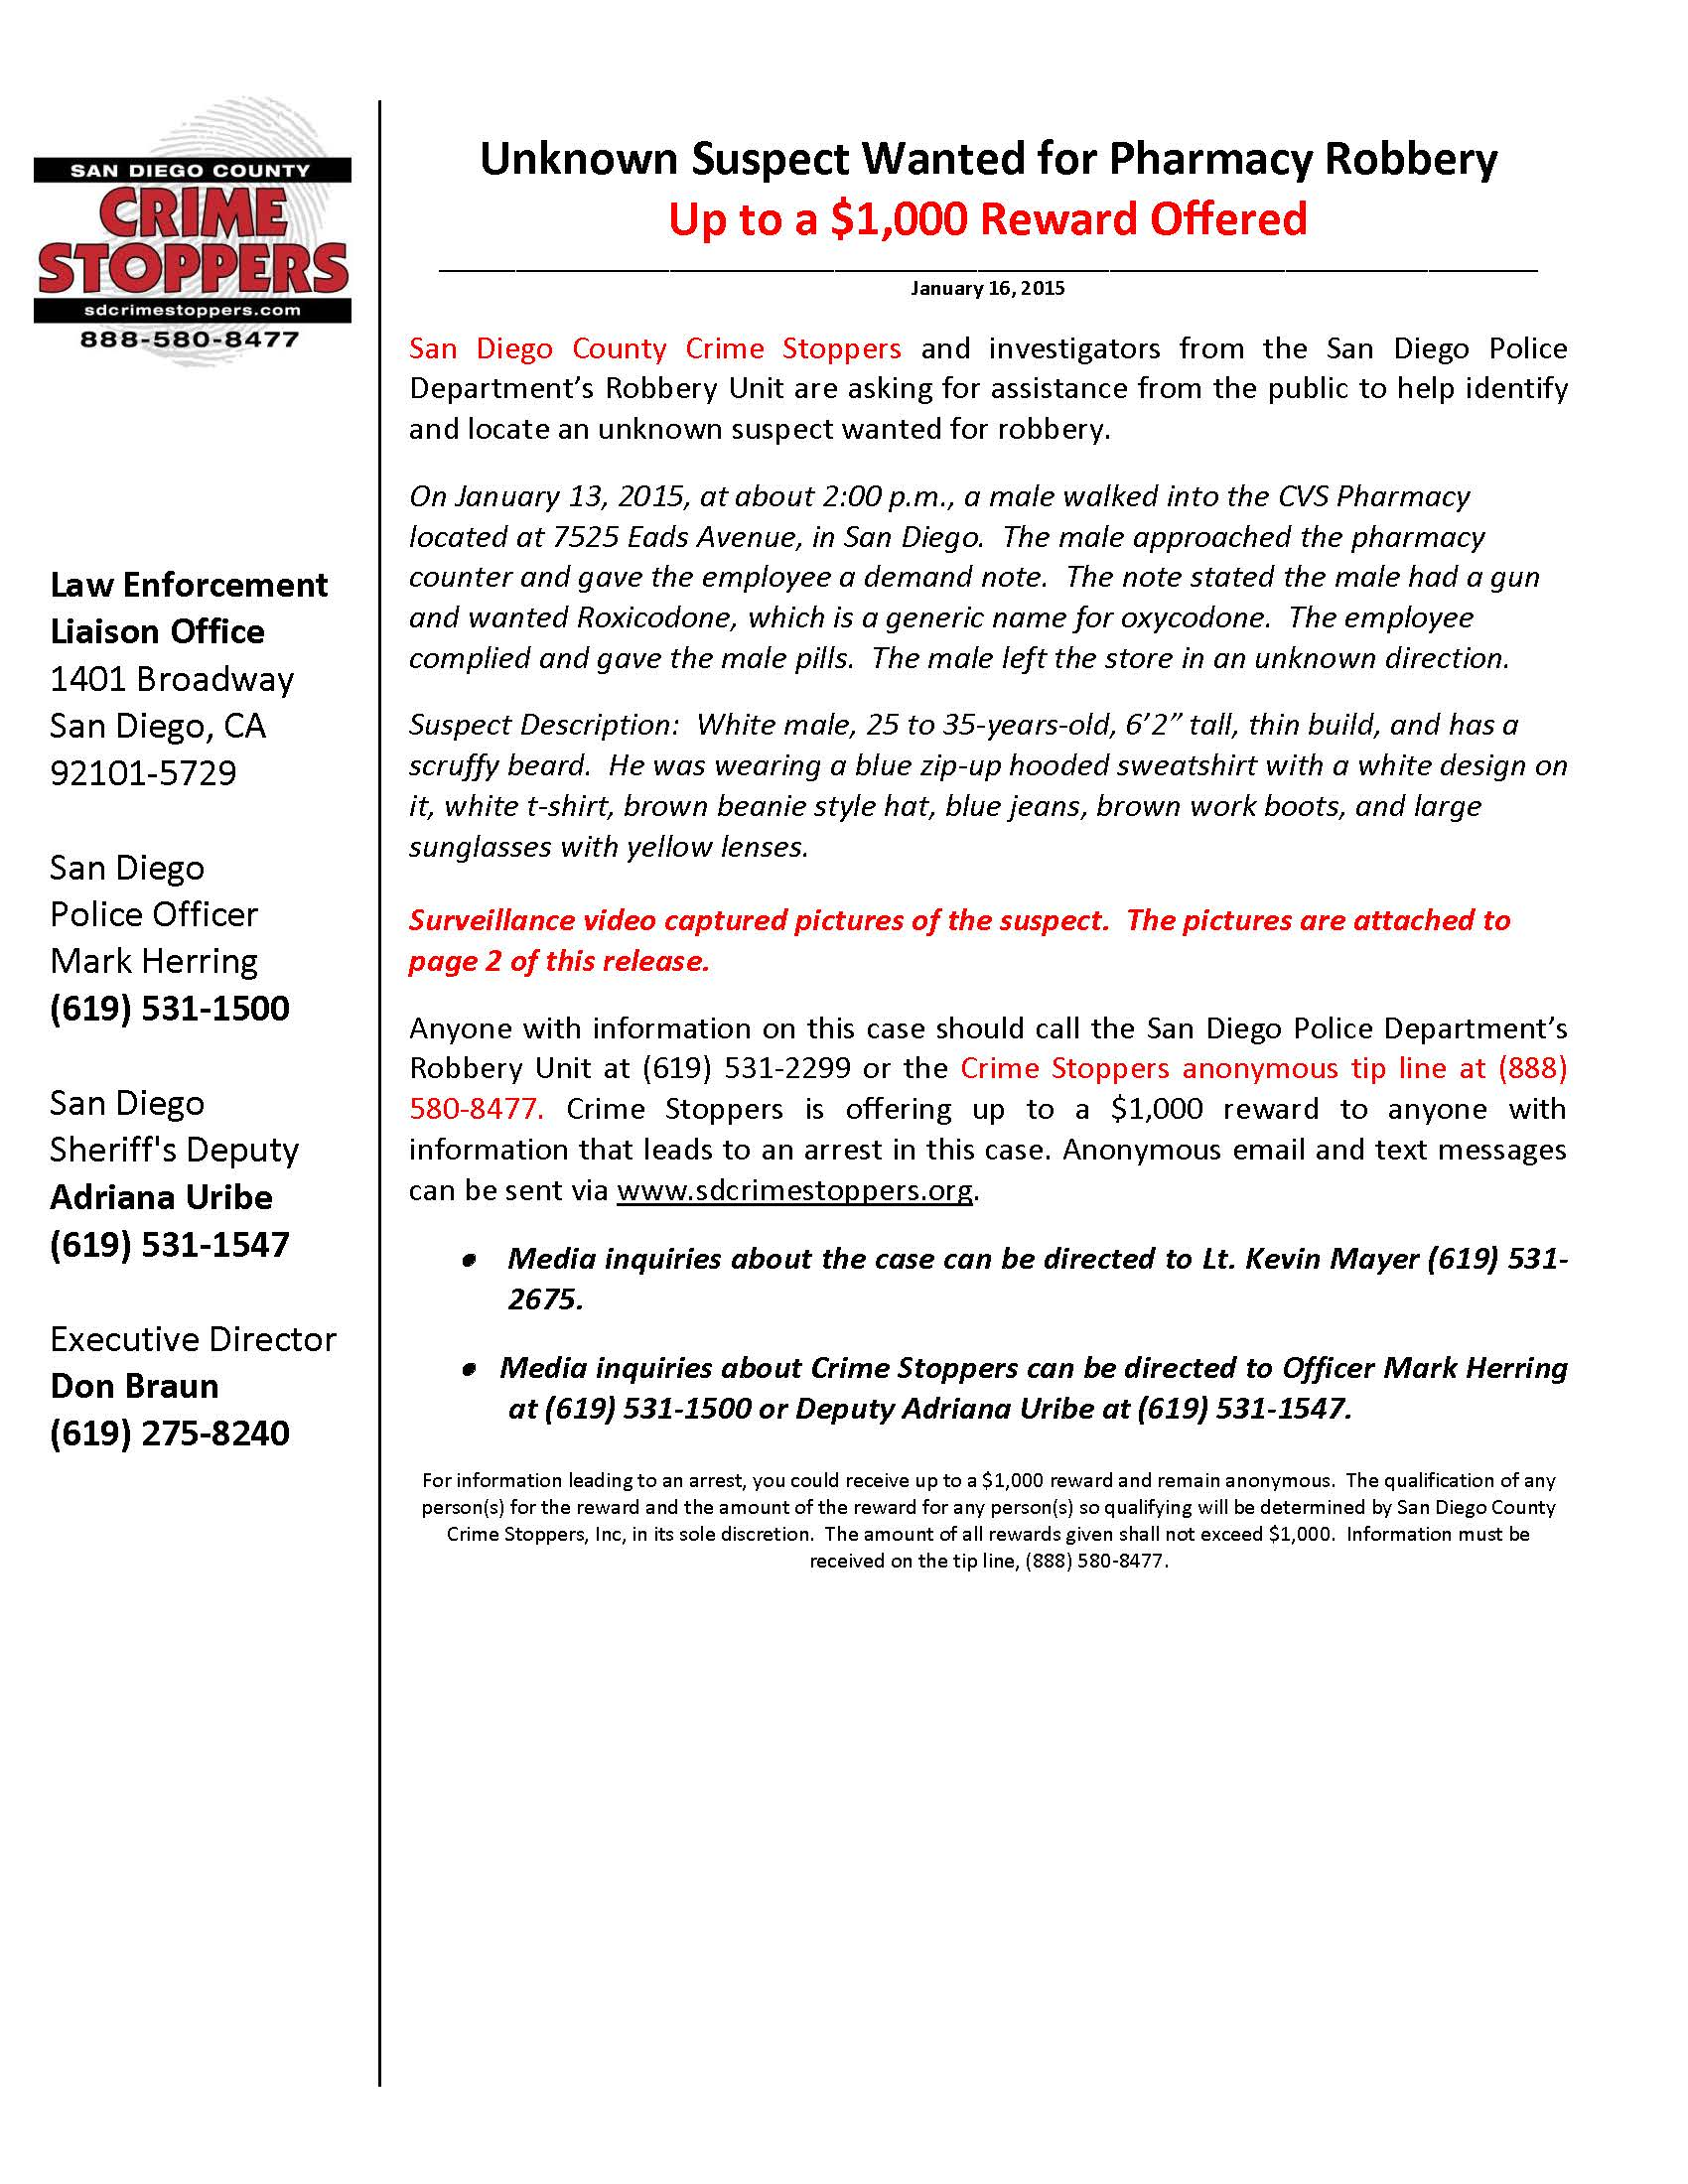 011615 CVS Pharmacy Robbery_Page_1